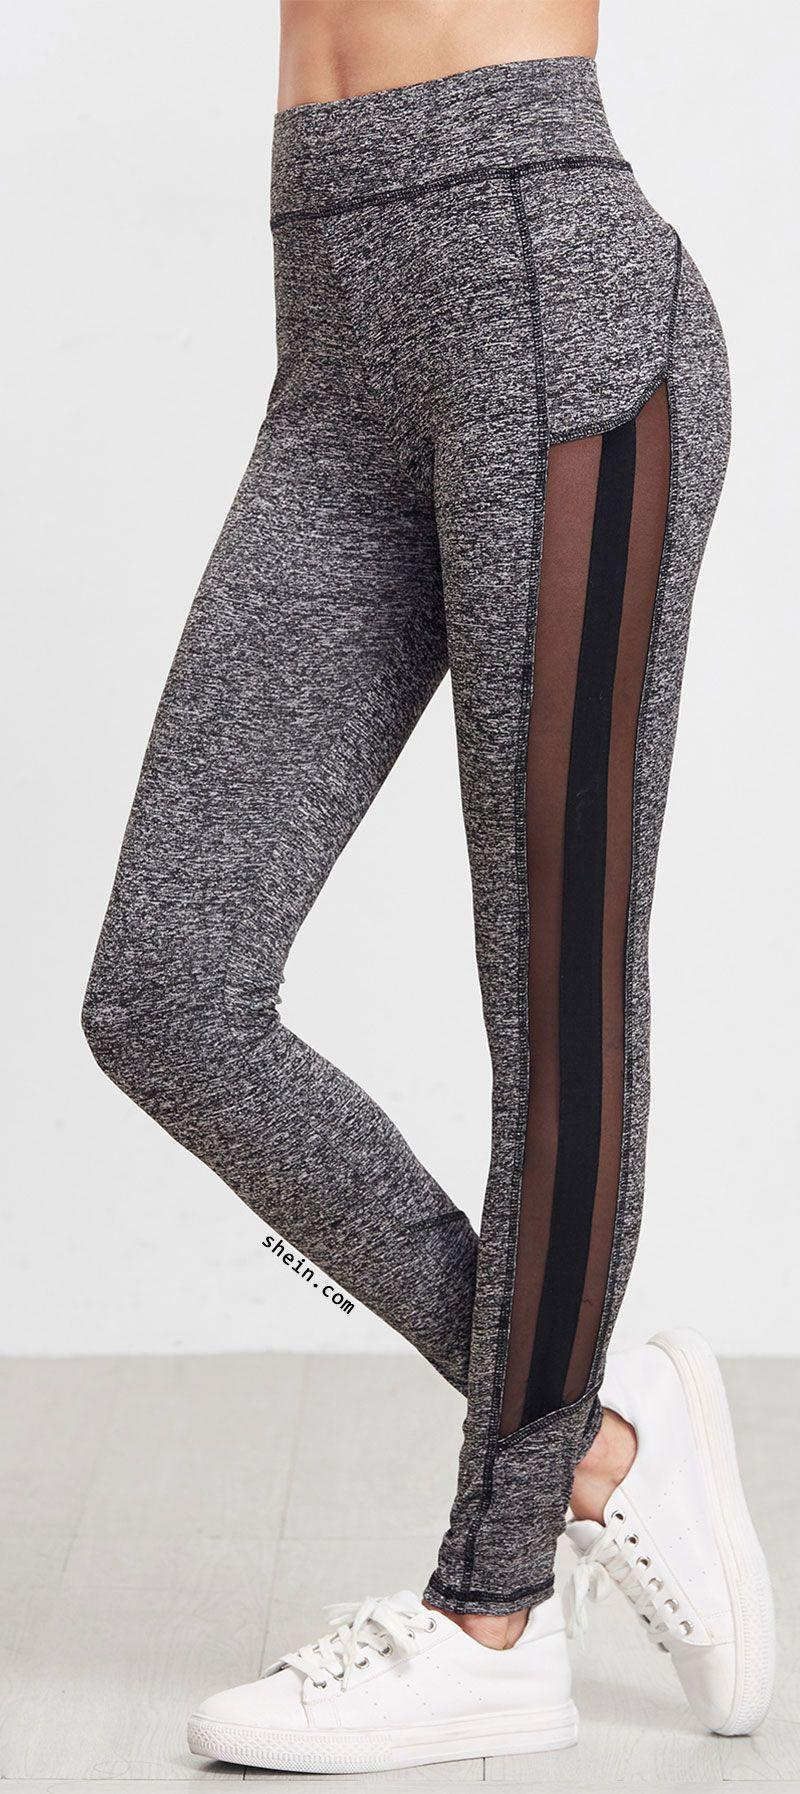 Ropa De Ejercicio · Outfit Deportivo · Grey Marled Knit Mesh Panel Leggings  https   womenfashionparadise.com  8e87b72bd2da